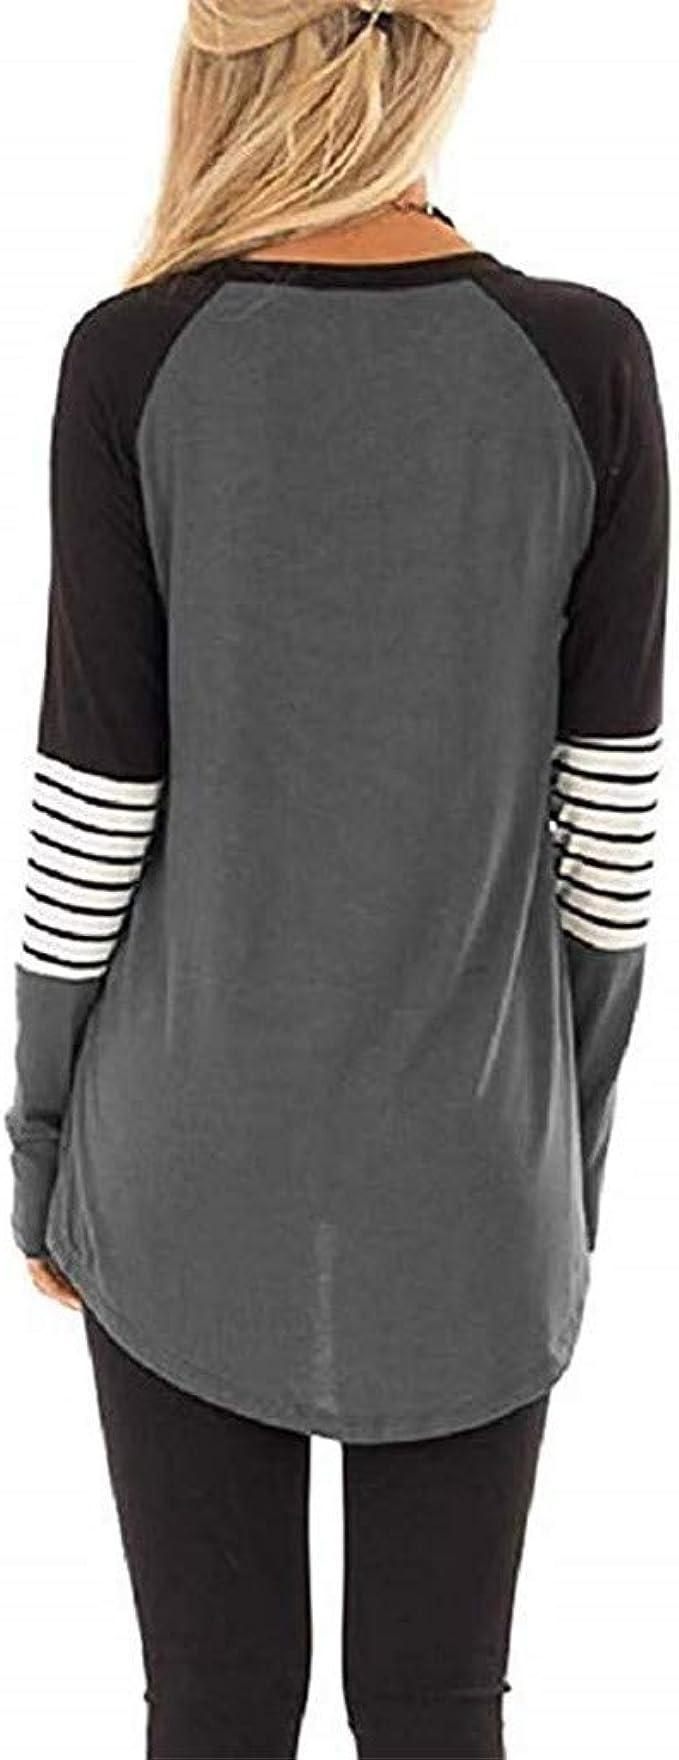 Manga Larga Negra Hombre Camiseta niño Body Negro Mujer Amarilla Gris Blend Larga Camiseta Manga Basica Gym Licra Azul Camisetas Manga Larga Mujer Azul Camiseta Encaje Lee Verde niño: Amazon.es: Ropa y